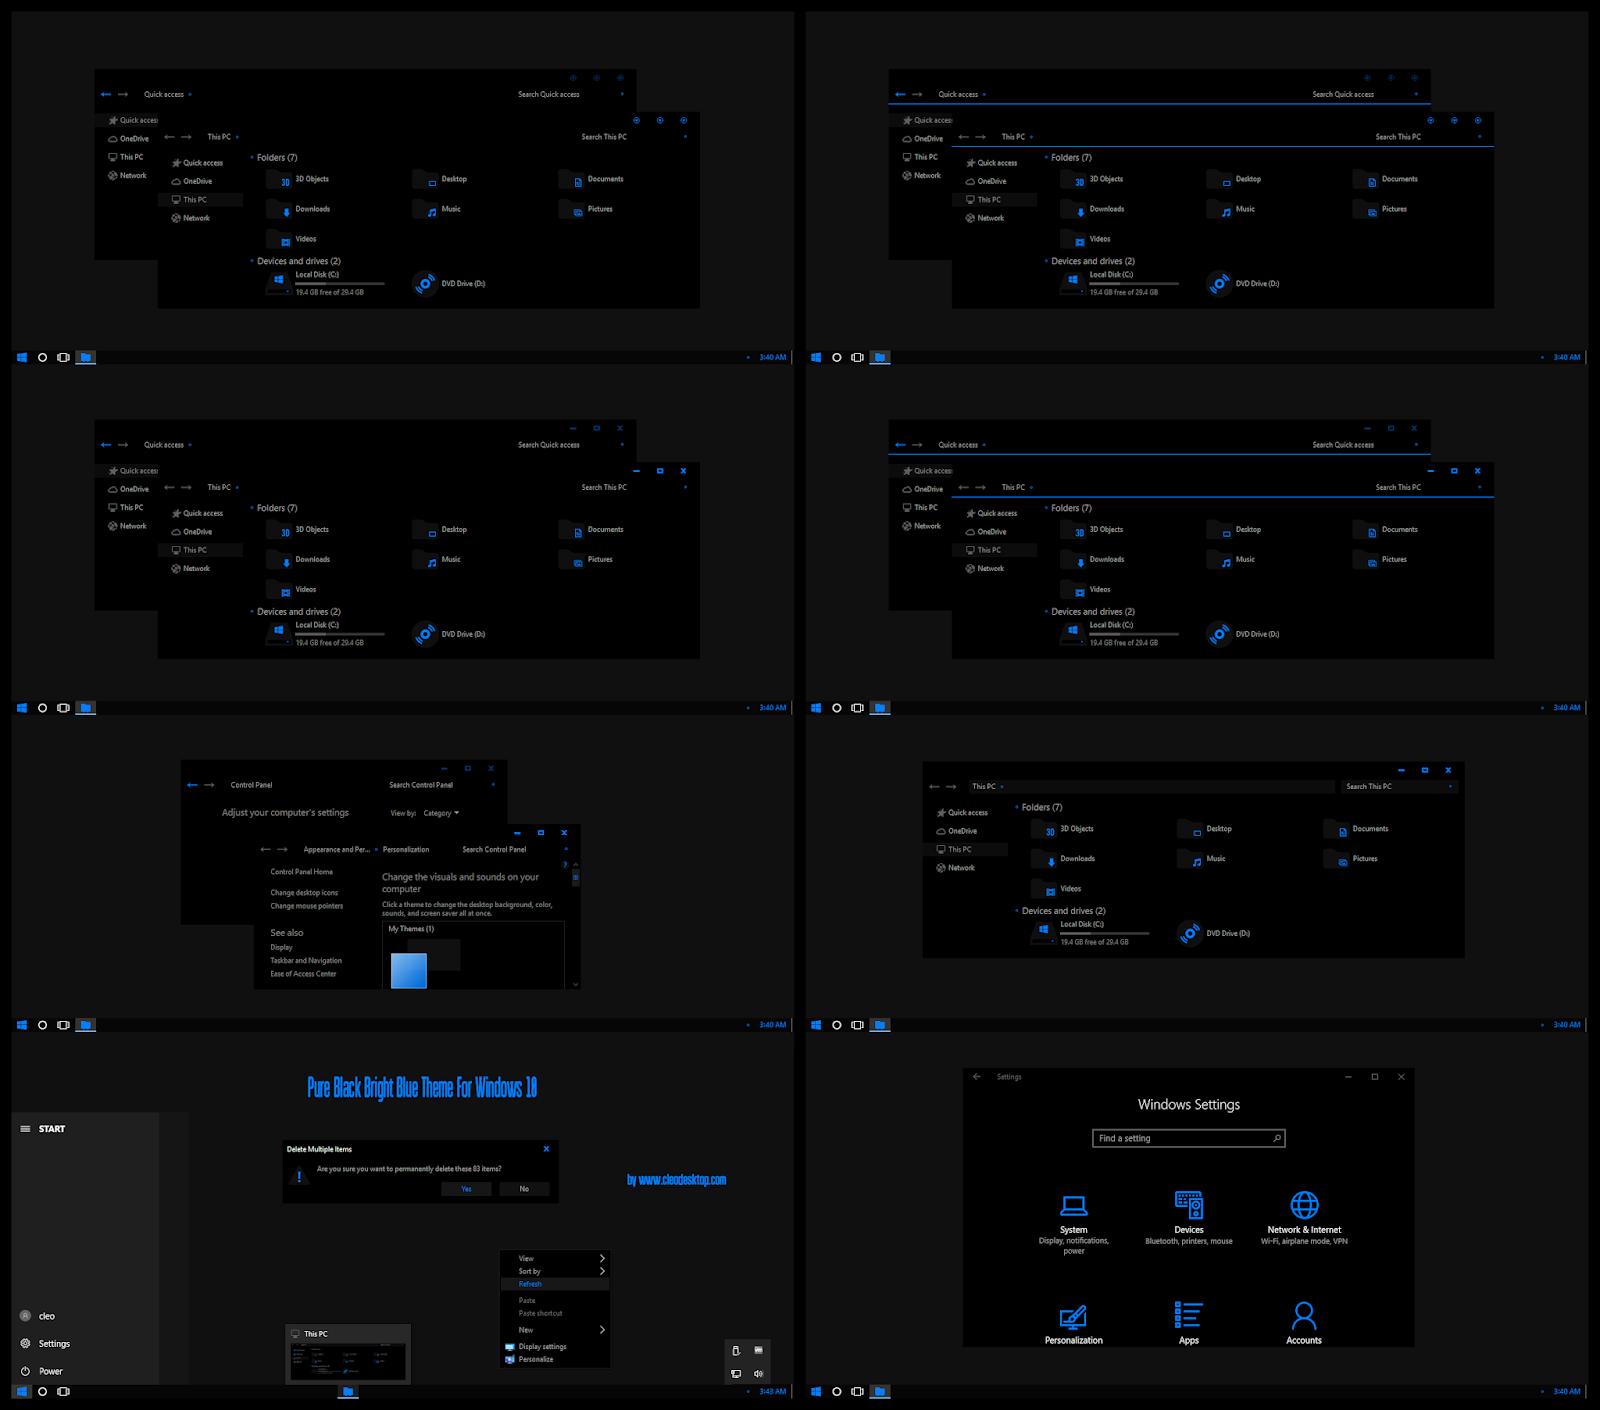 Pure Black Bright Blue Theme Windows10 May 2019 Update 1903